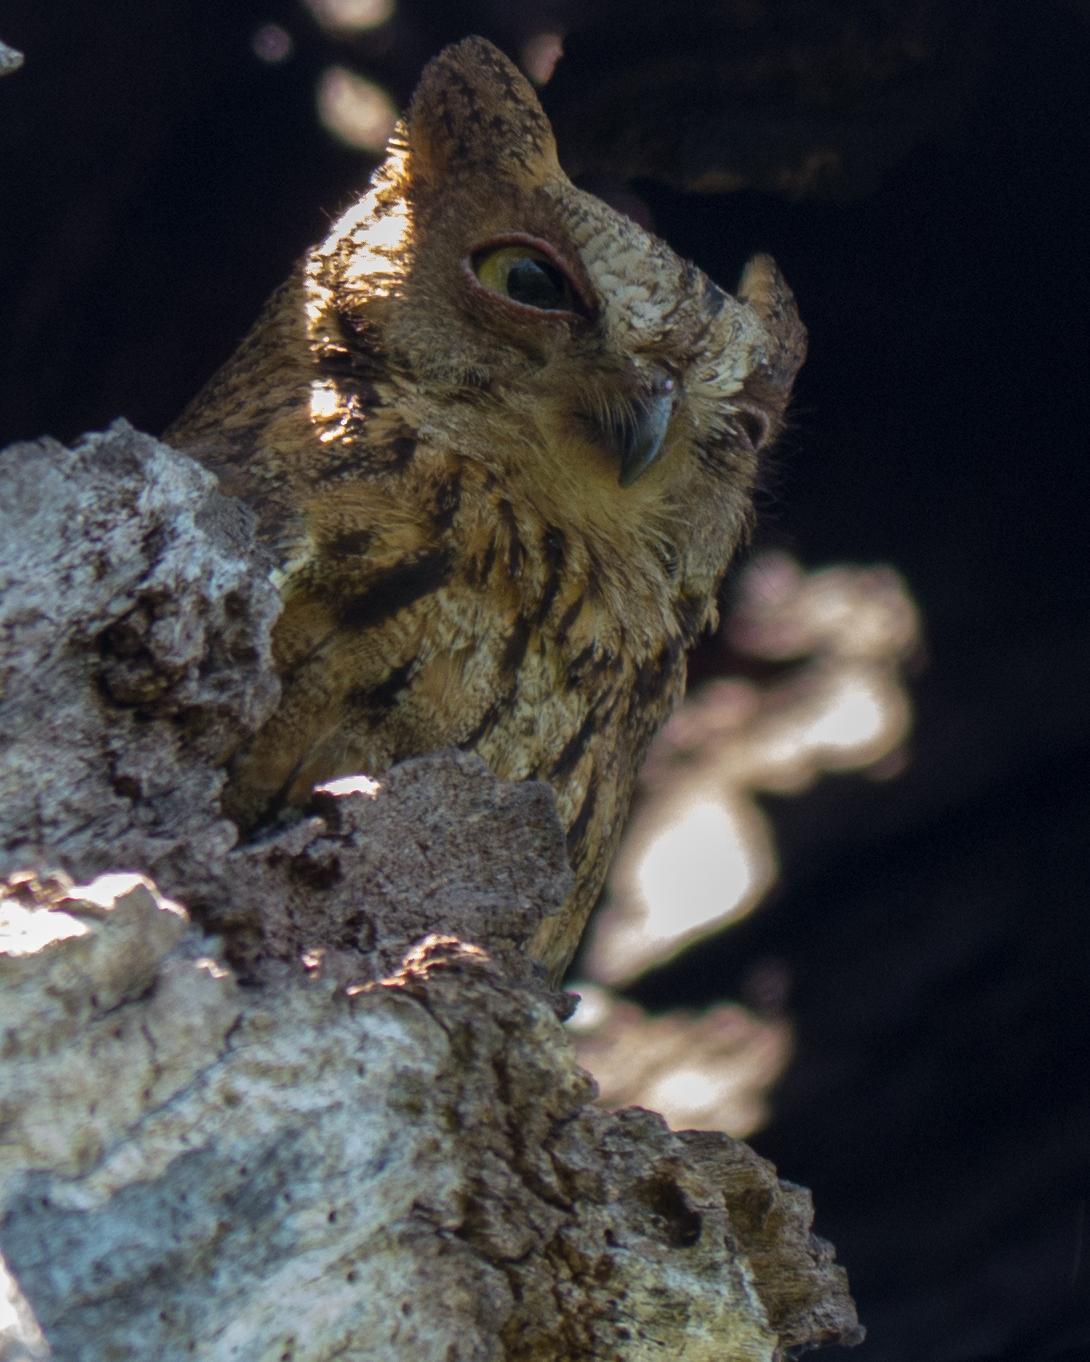 Torotoroka Scops-Owl Photo by Randy Siebert